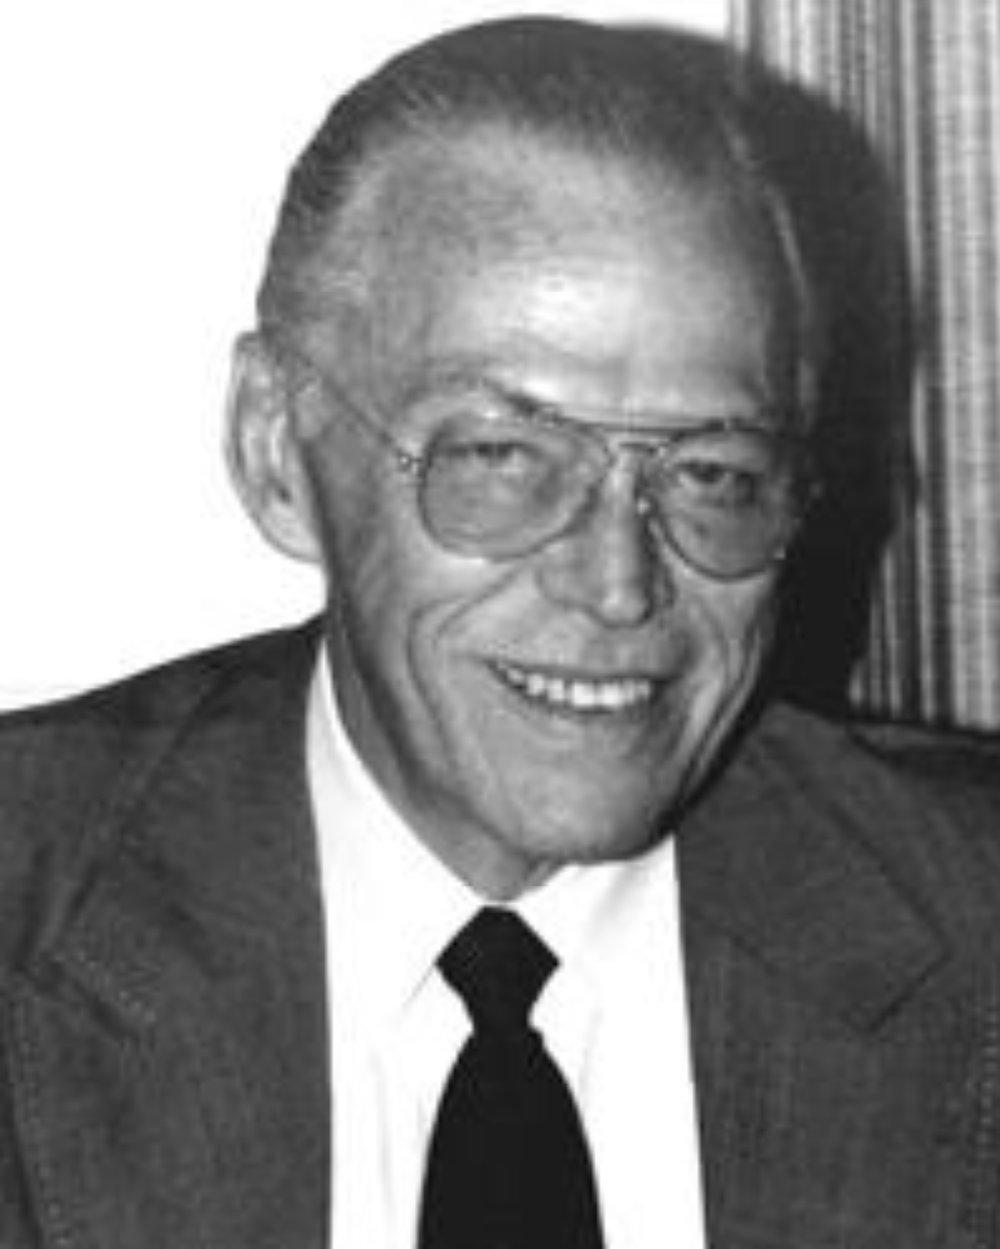 JOHN H. KNIGHTLY